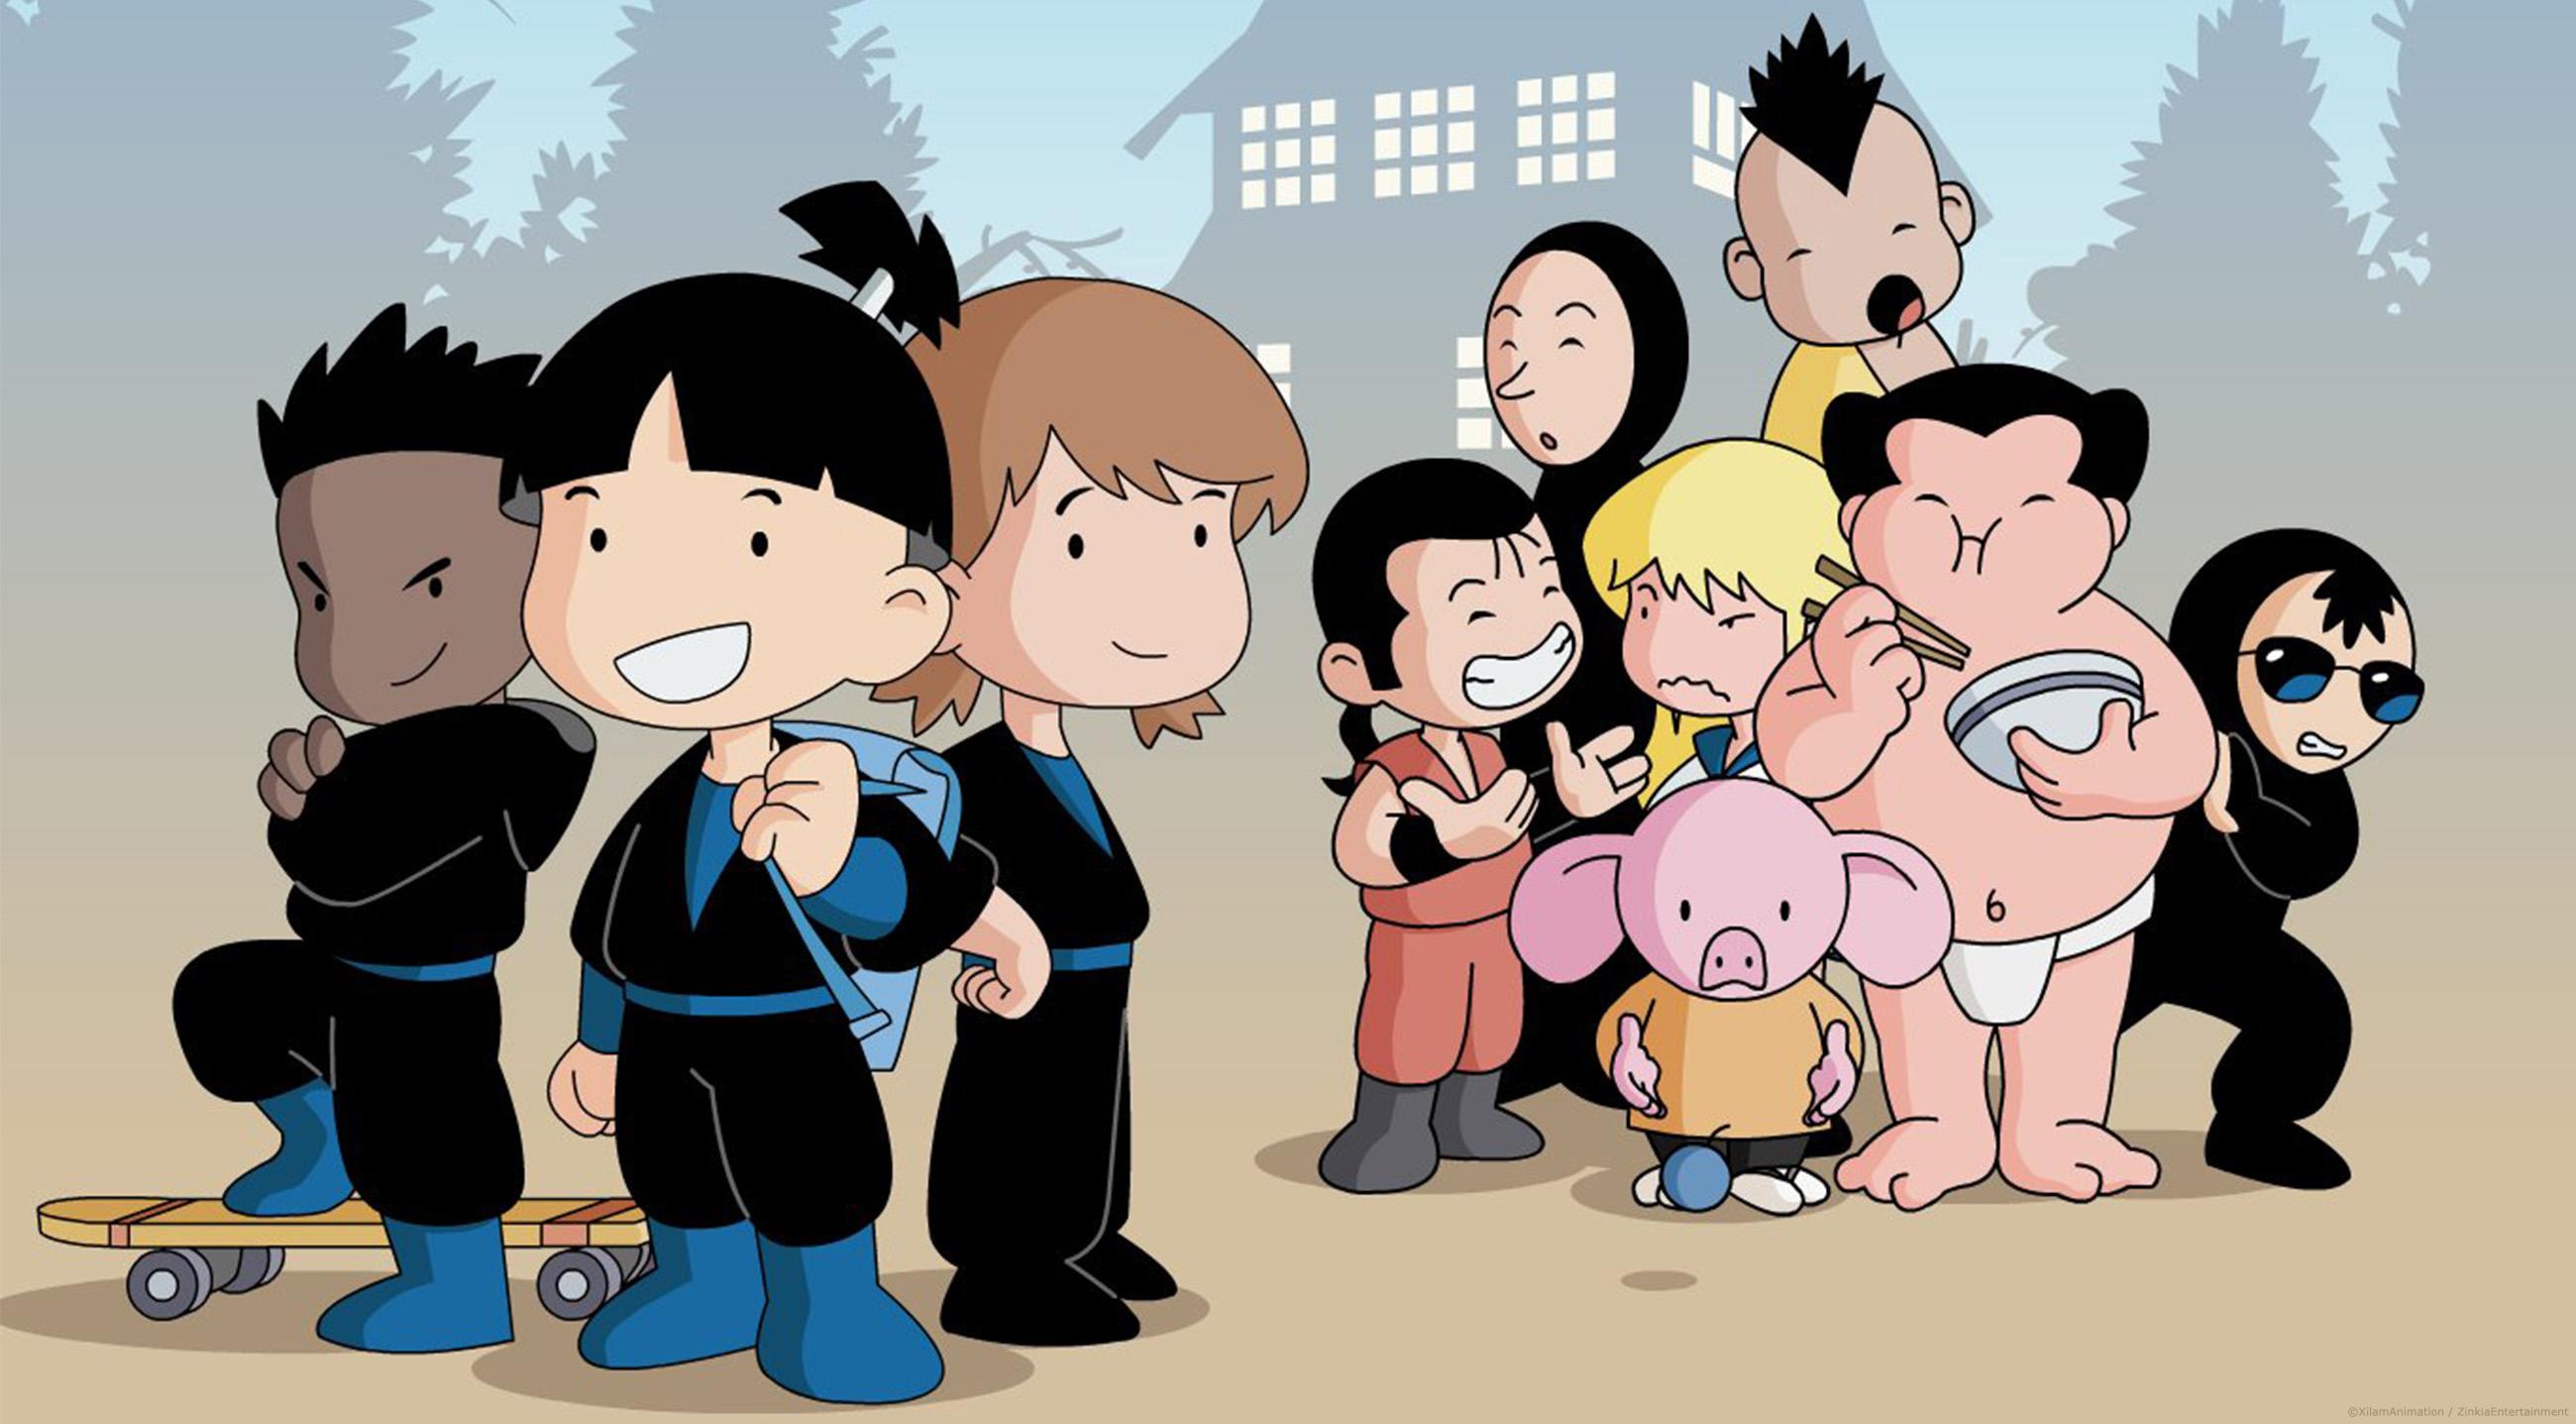 Shuriken school dessin anim e pour enfant d cors - Shuriken school ...